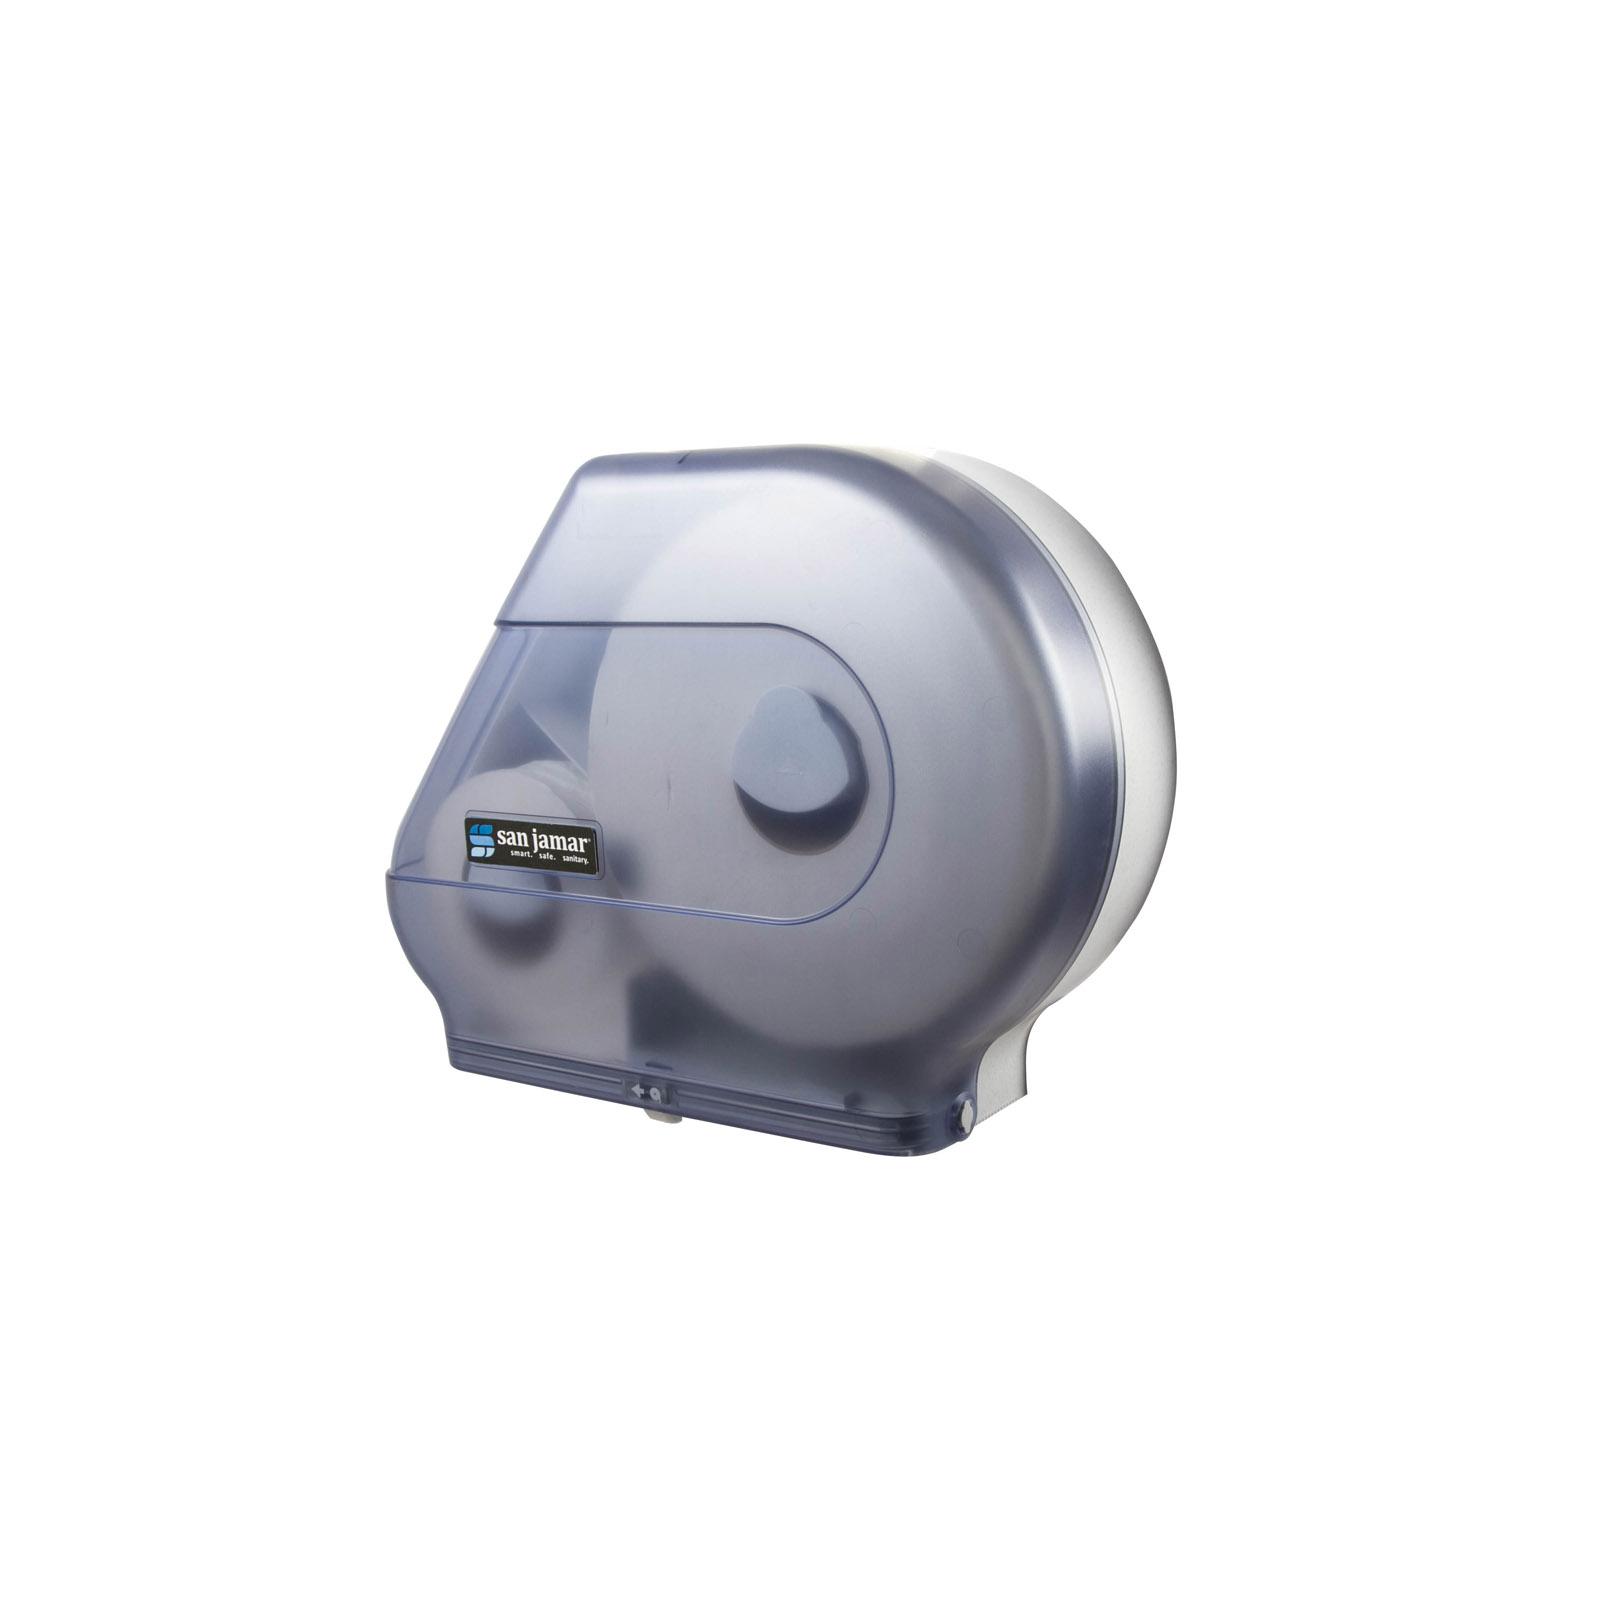 San Jamar R6500TBL toilet tissue dispenser